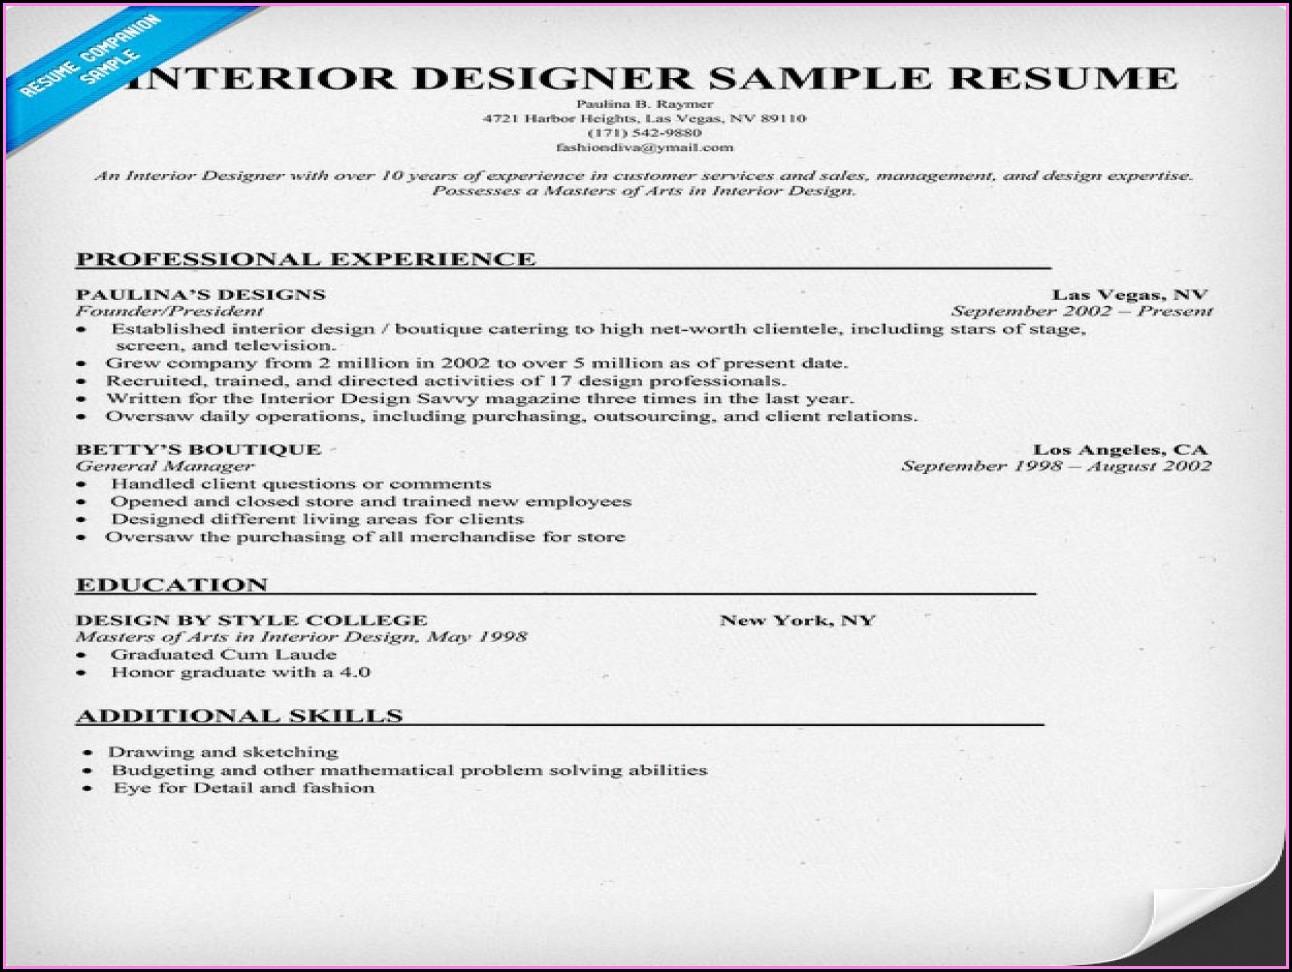 Best Free Online Resume Builder 2015